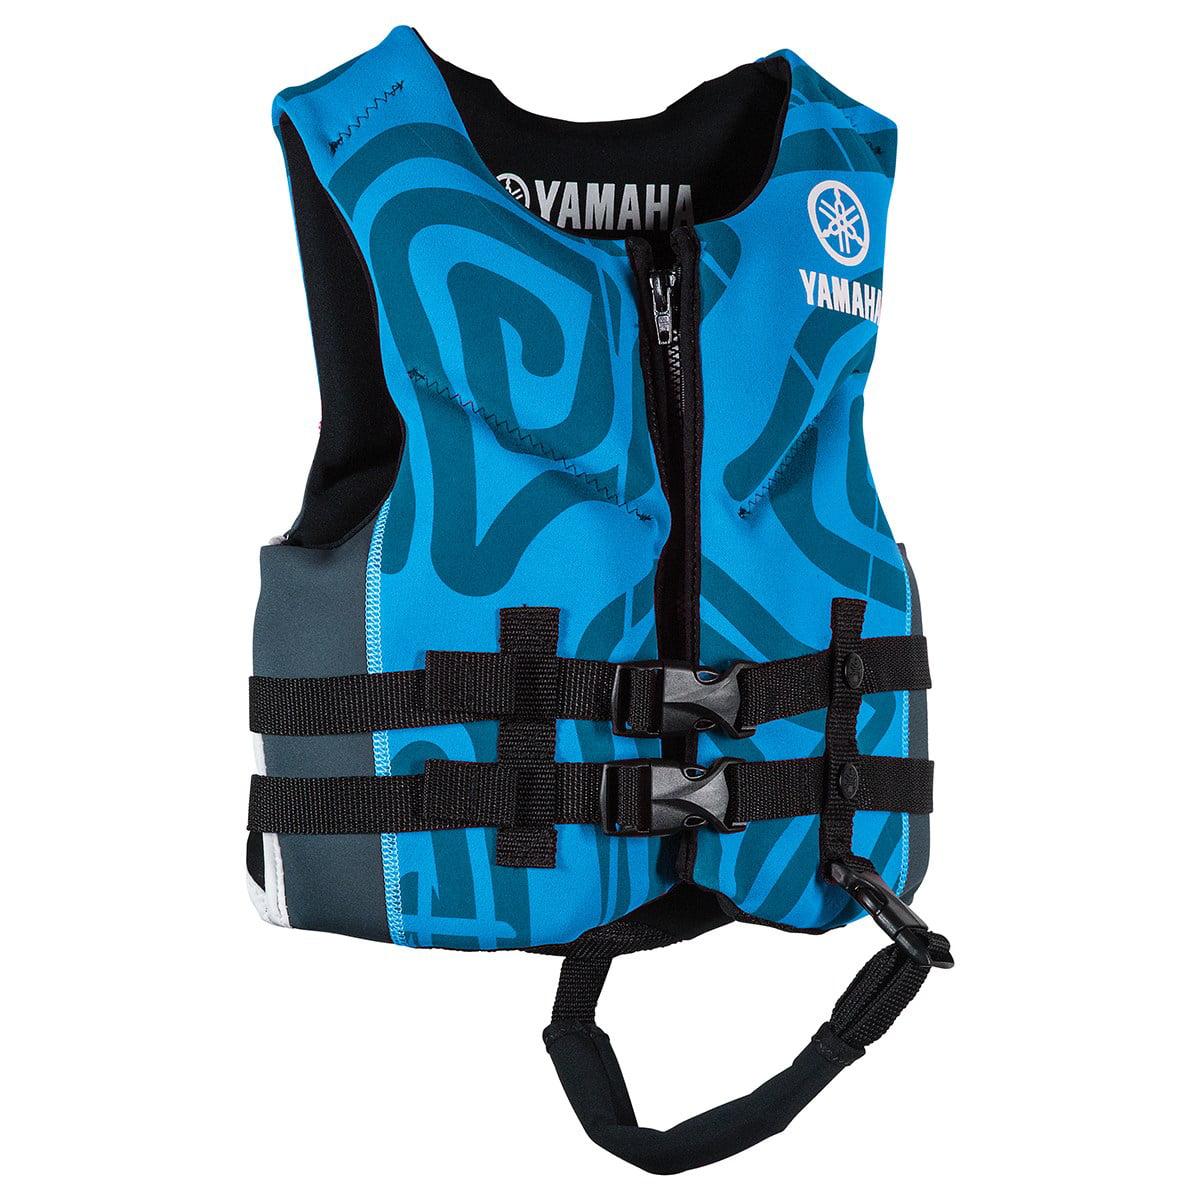 Yamaha Children's Neoprene Life Vest Jacket PFD